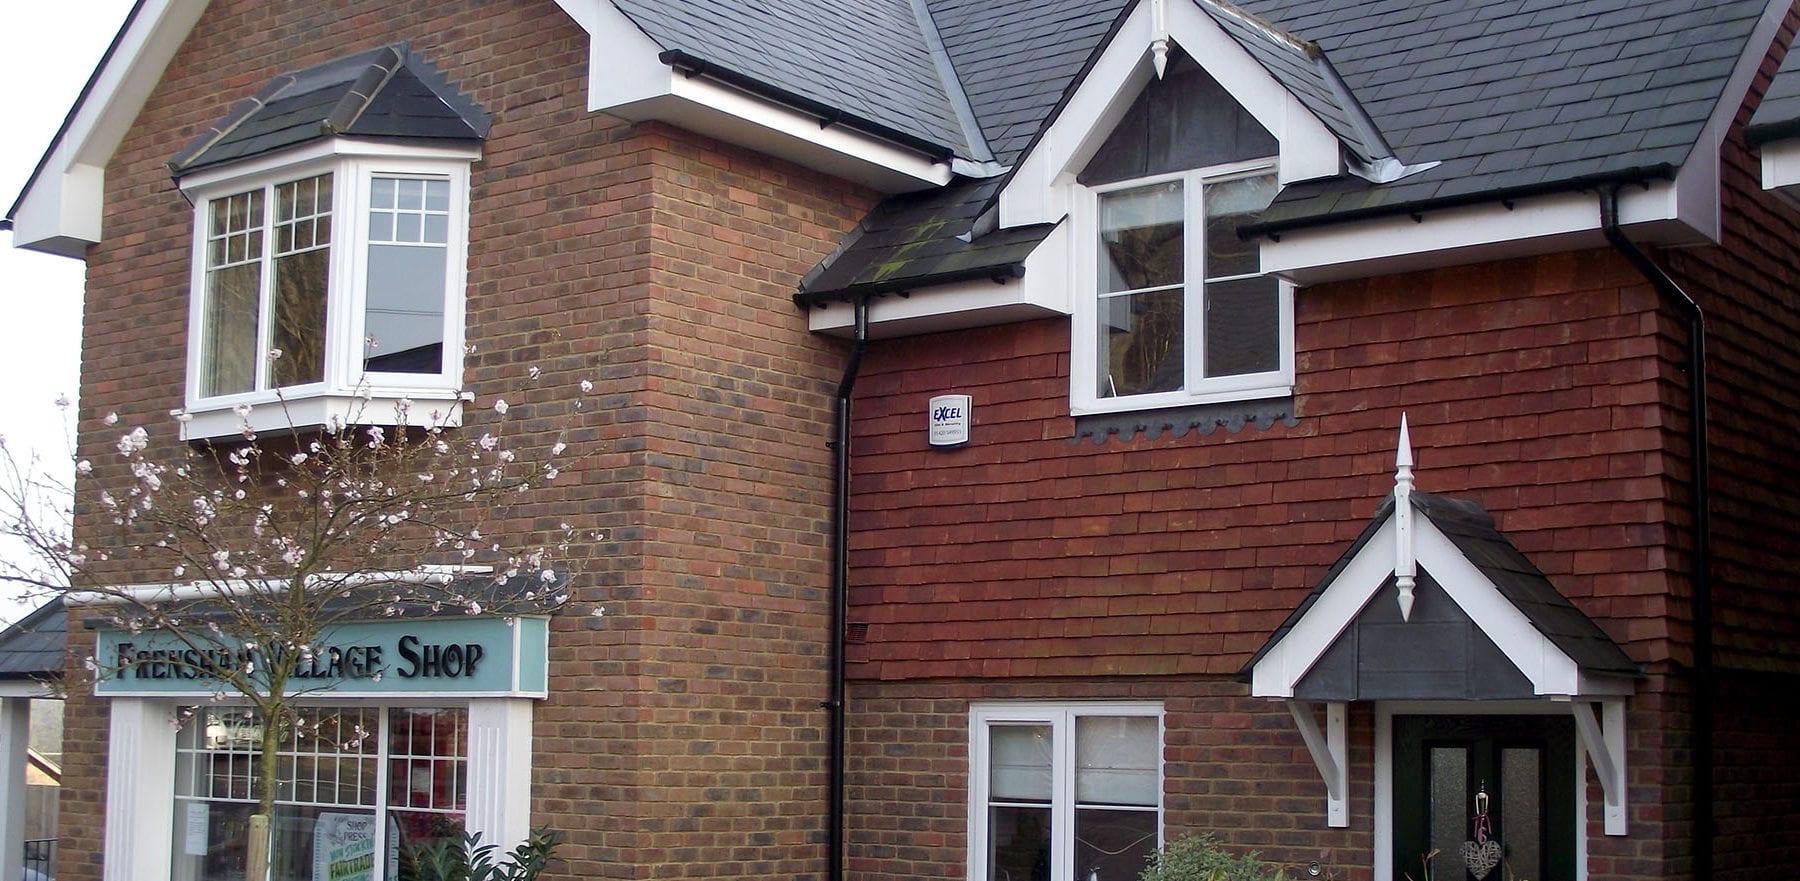 Lifestiles - Handmade Red Clay Roof Tiles - Frensham, England 4